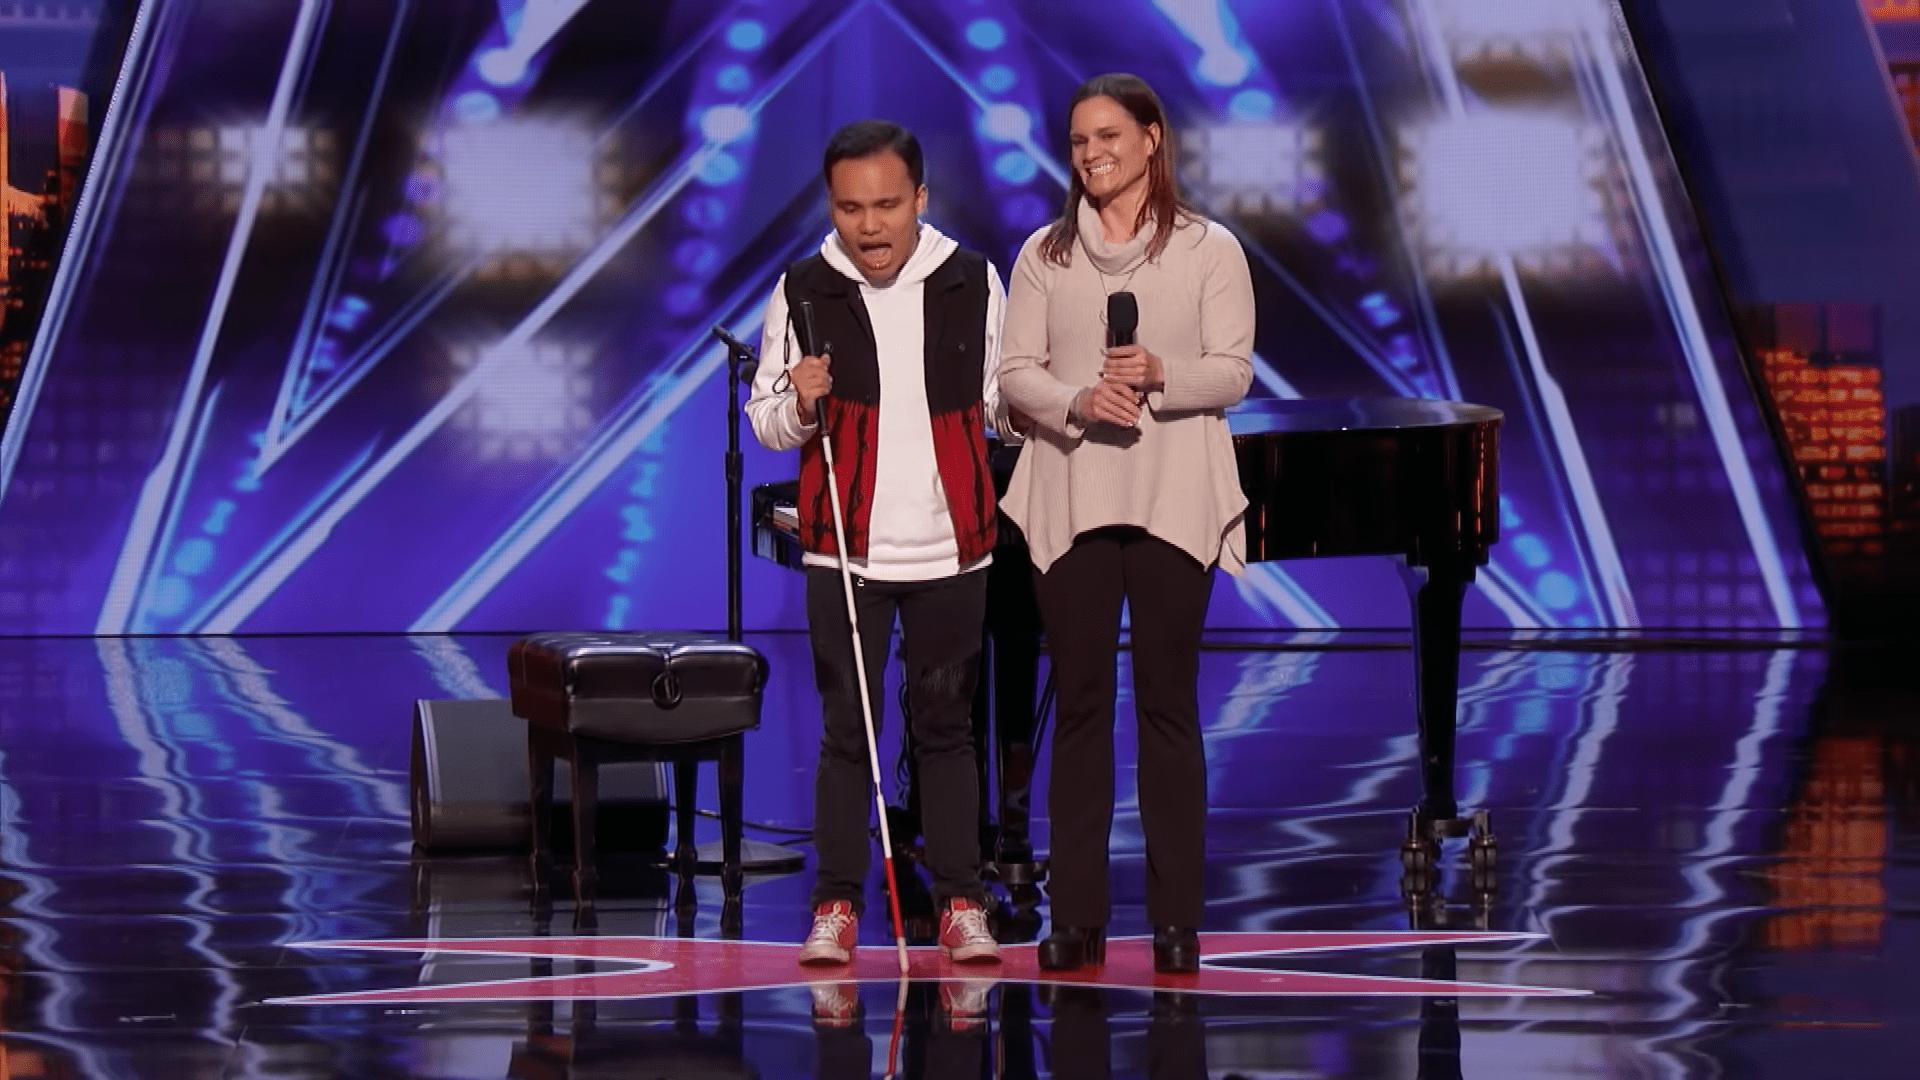 Kodi con su mamá │Imagen tomada de: YouTube / America's Got Talent